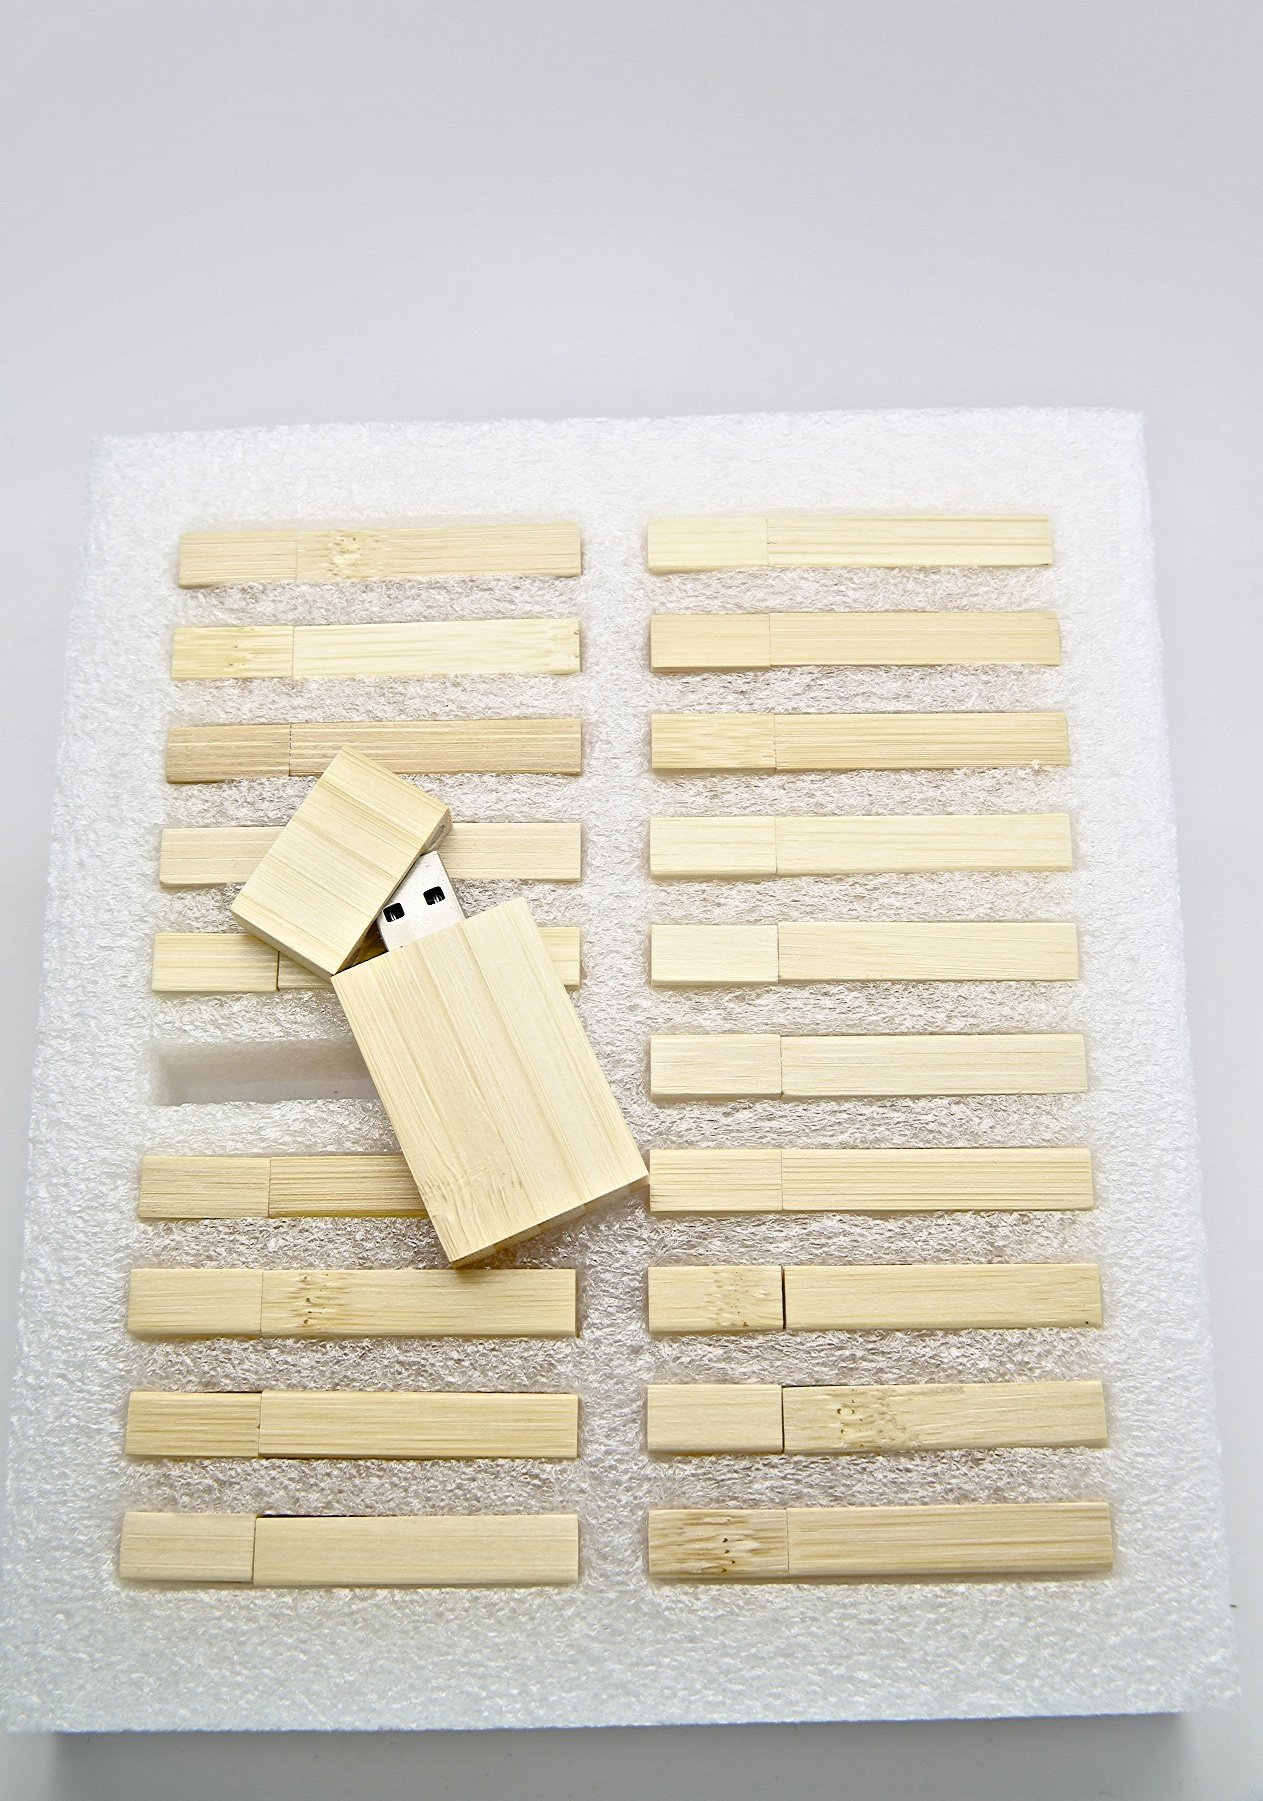 20 4GB Flash Drive - Bulk Pack - USB 2.0 Wooden Bamboo Stick Design - 4 GB Flash Drive by SameDayFlash